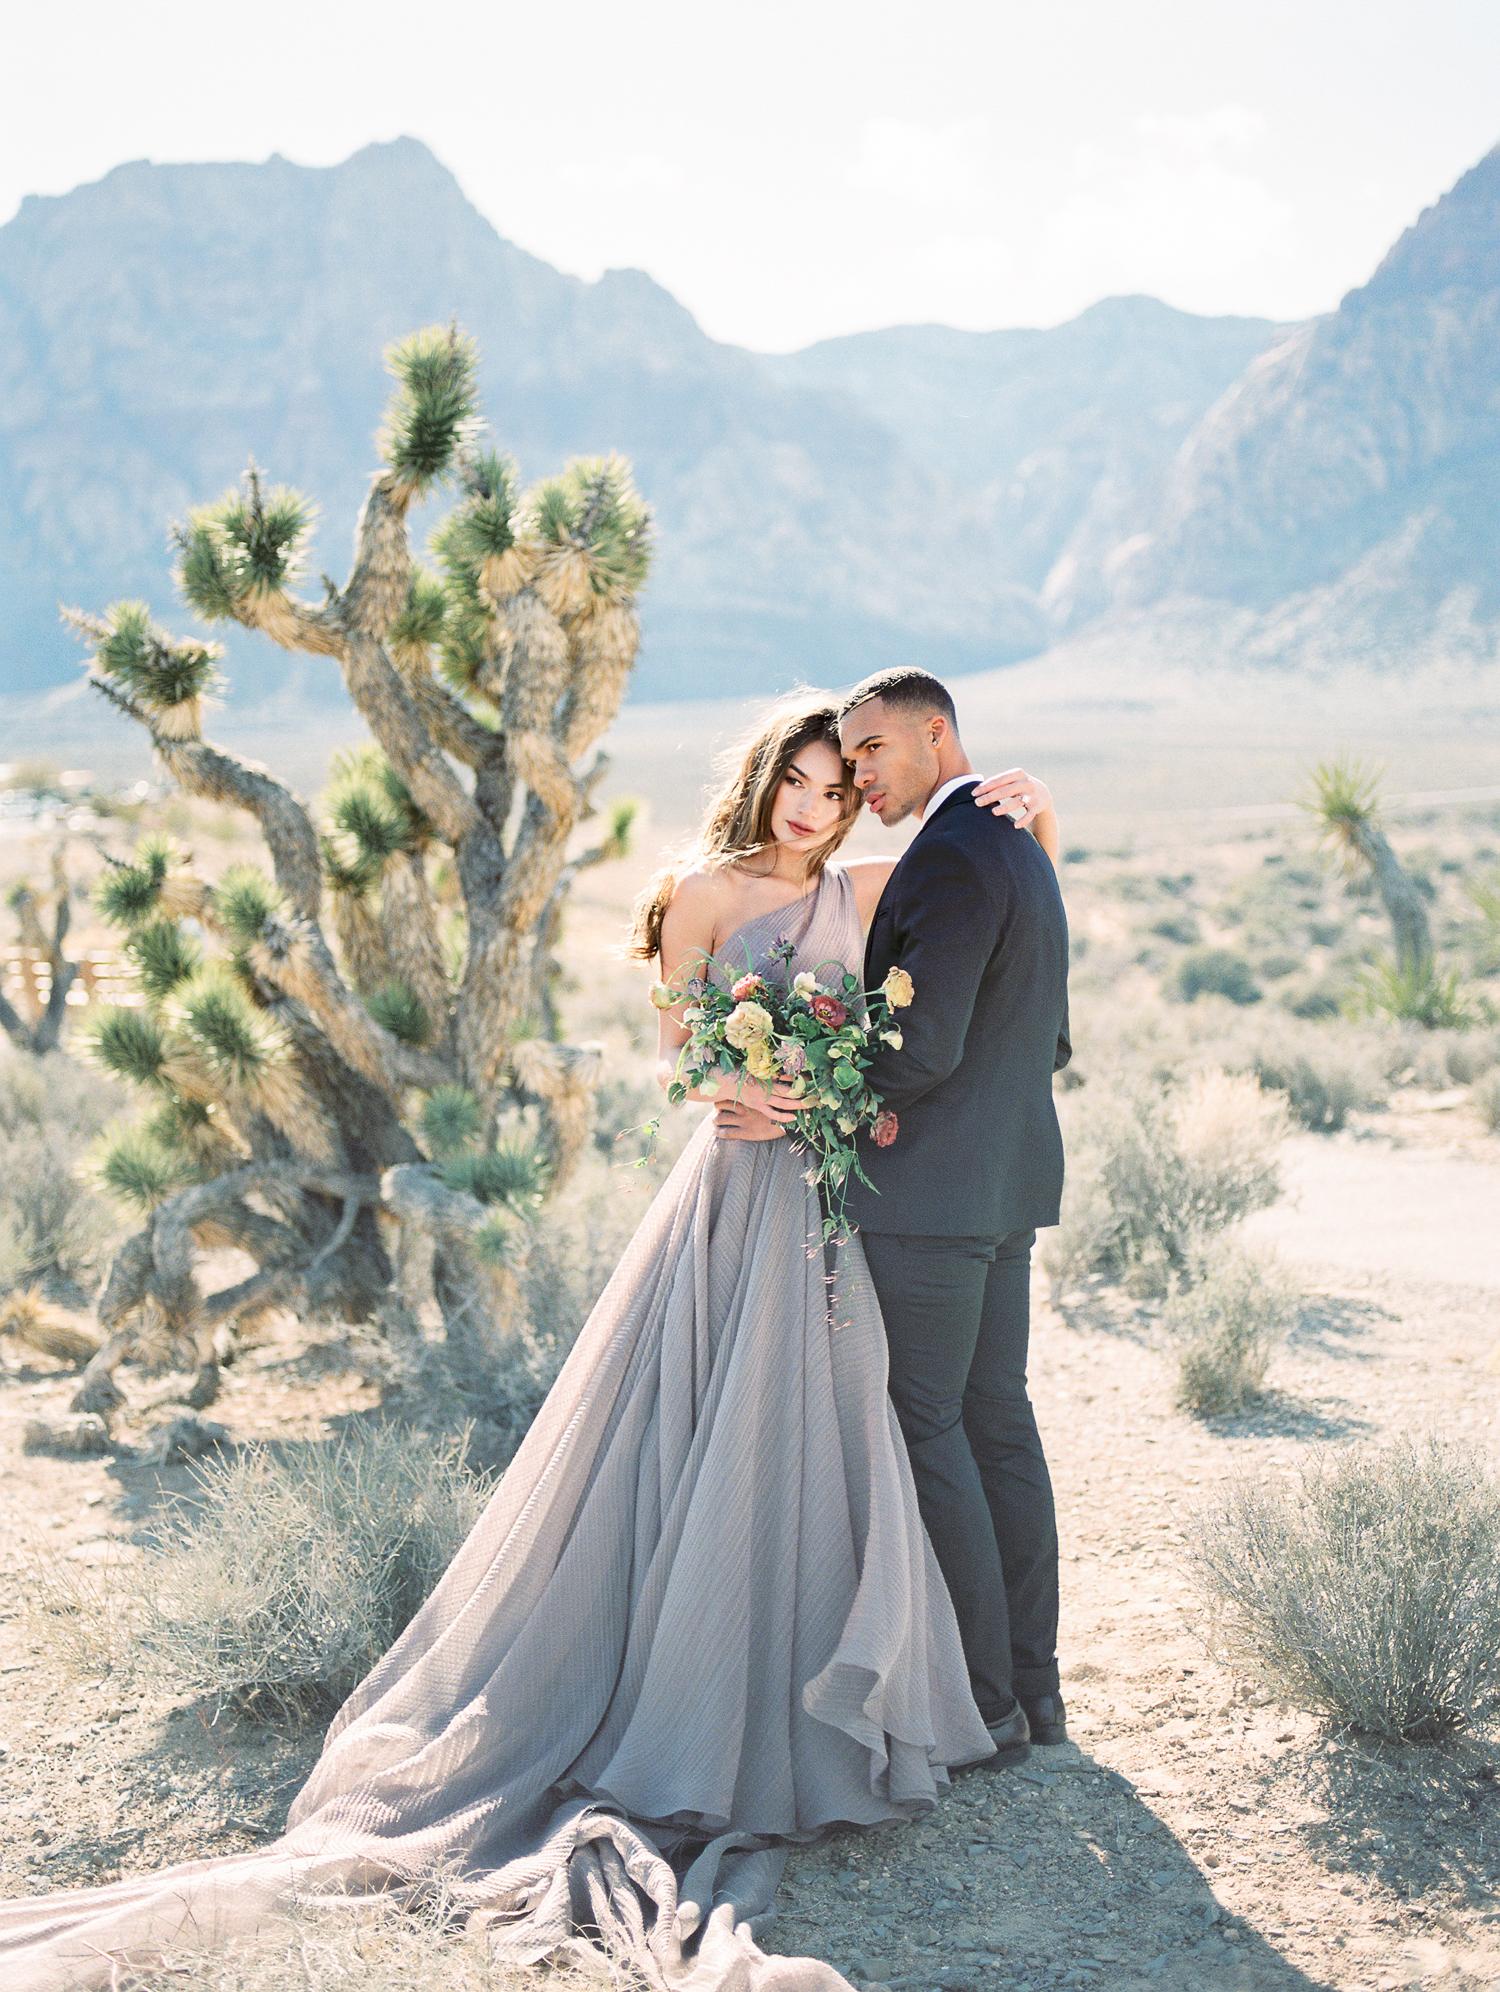 Brittany Bekas - Las Vegas Chicago Engagement Photographer-4.jpg